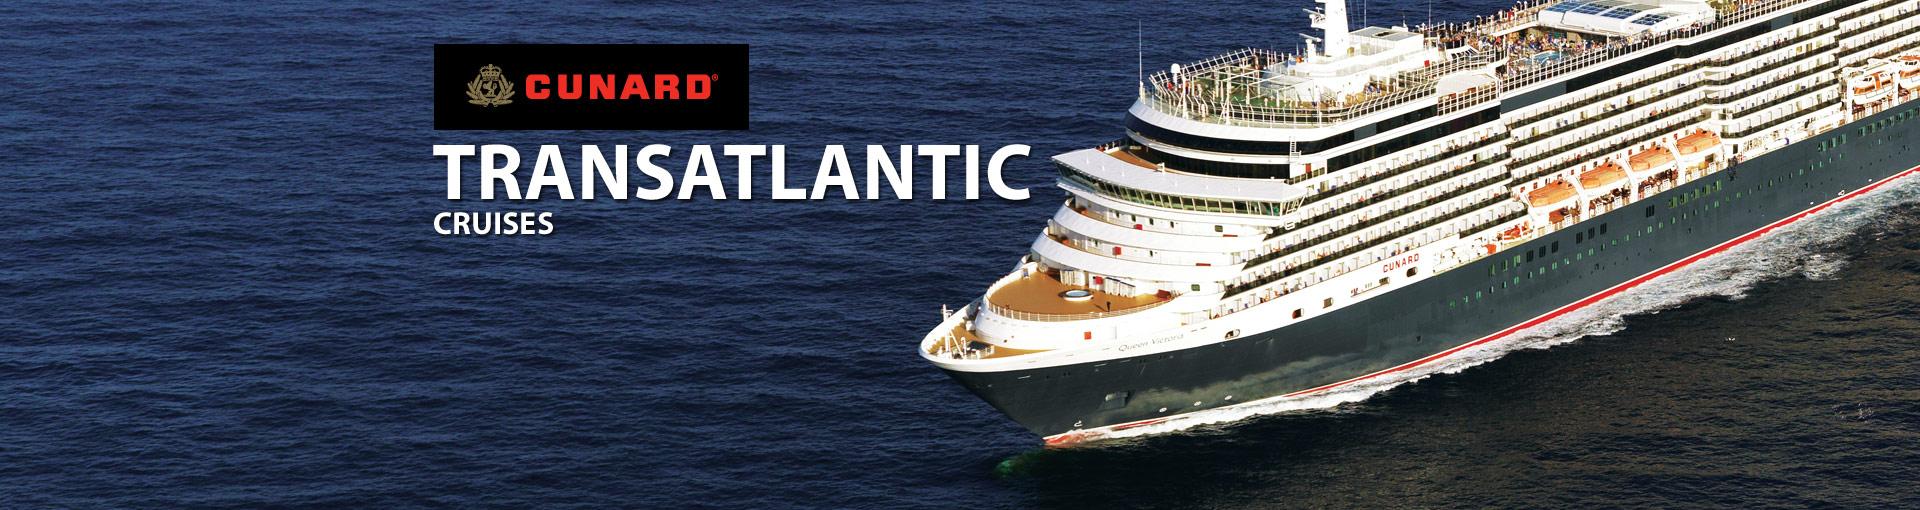 Cunard Line Transatlantic Cruises